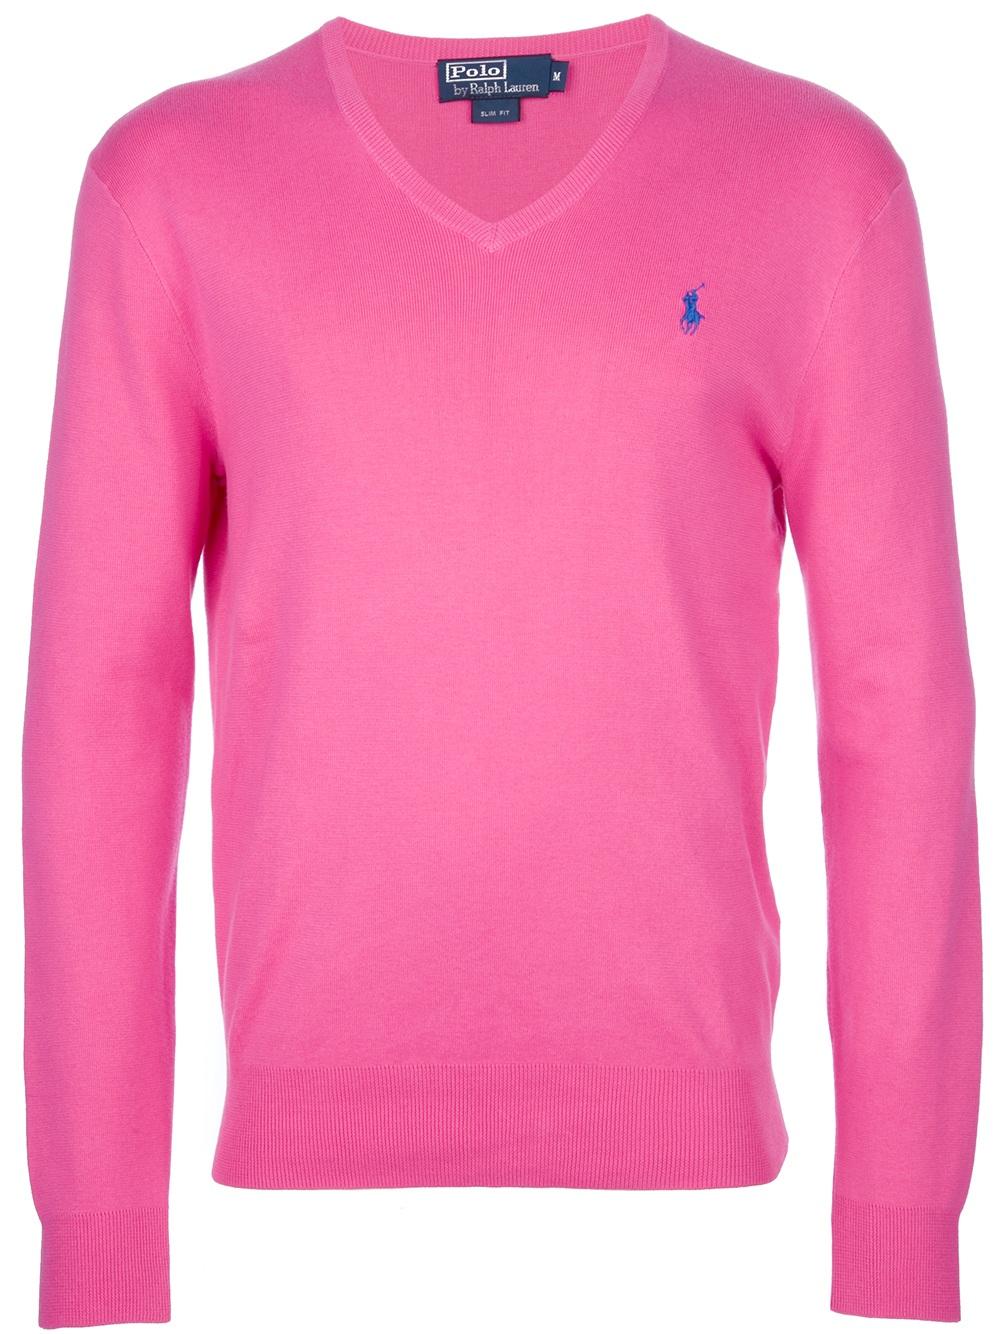 polo ralph lauren v neck sweater in pink for men lyst. Black Bedroom Furniture Sets. Home Design Ideas